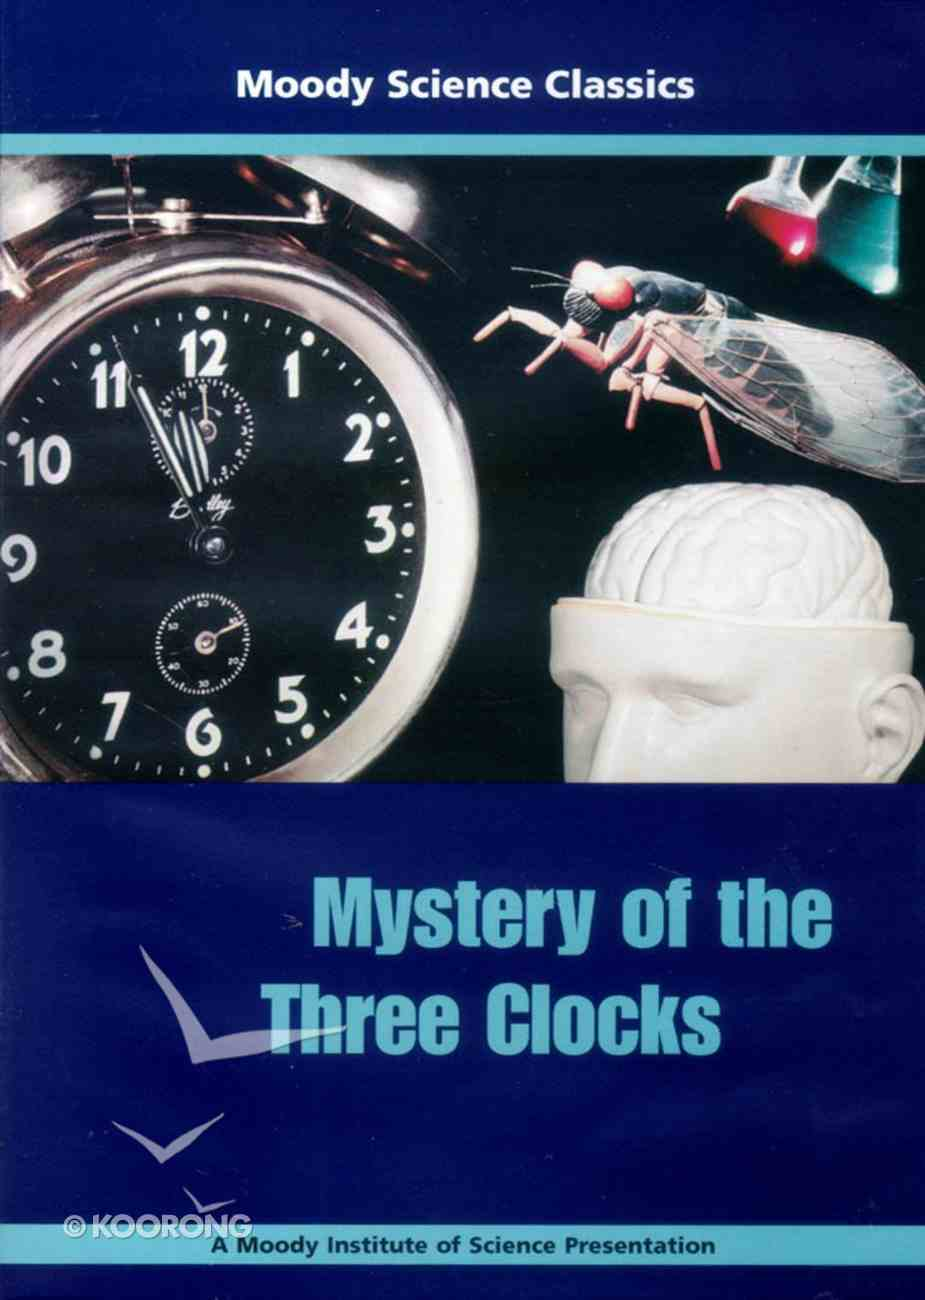 Mystery of the Three Clocks (Moody Science Classics Series) DVD